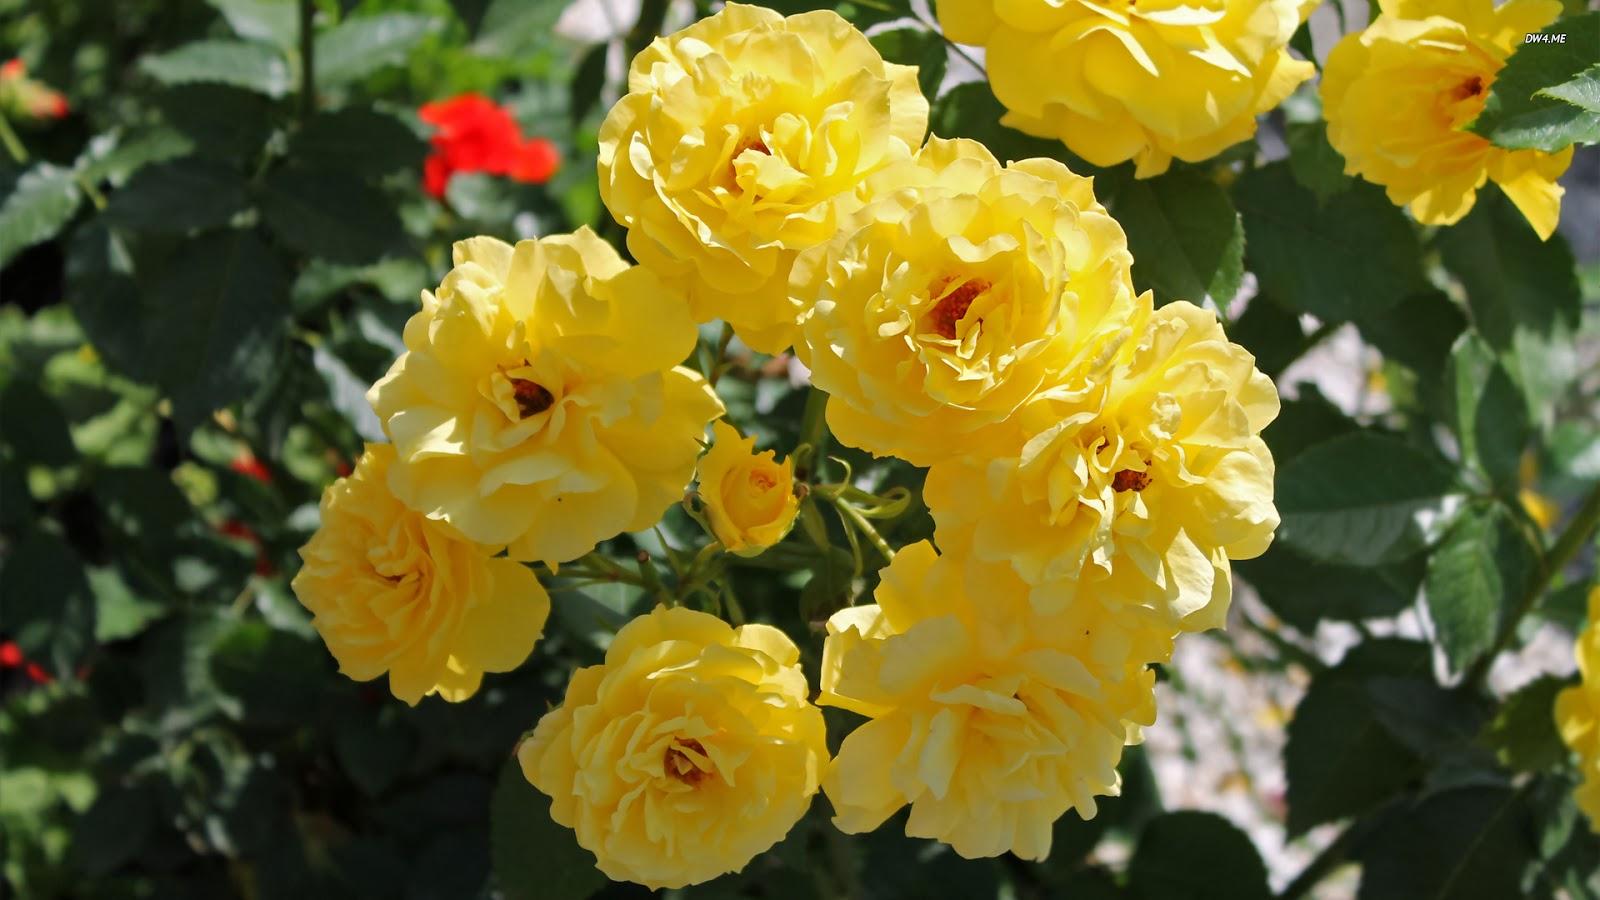 570 Yellow Roses 1920x1080 Flower Wallpaper